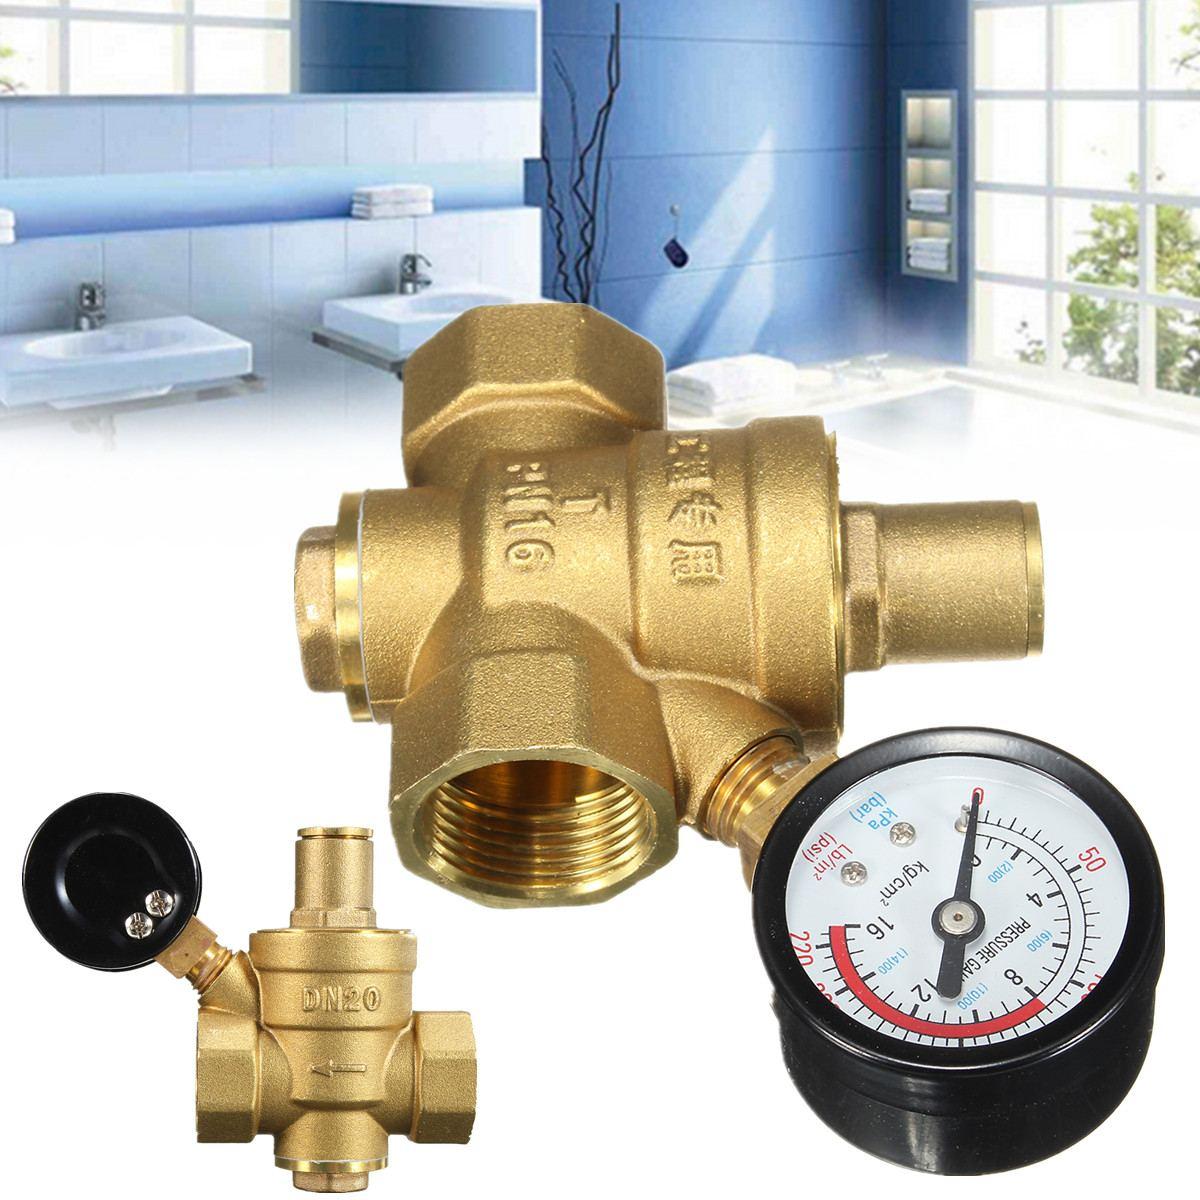 Brass Water Pressure Regulator Reducer DN20 NPT 3/4 Adjustable With Gauge Meter PN 1.6 for Hydraulic Instability/Water PurifierBrass Water Pressure Regulator Reducer DN20 NPT 3/4 Adjustable With Gauge Meter PN 1.6 for Hydraulic Instability/Water Purifier